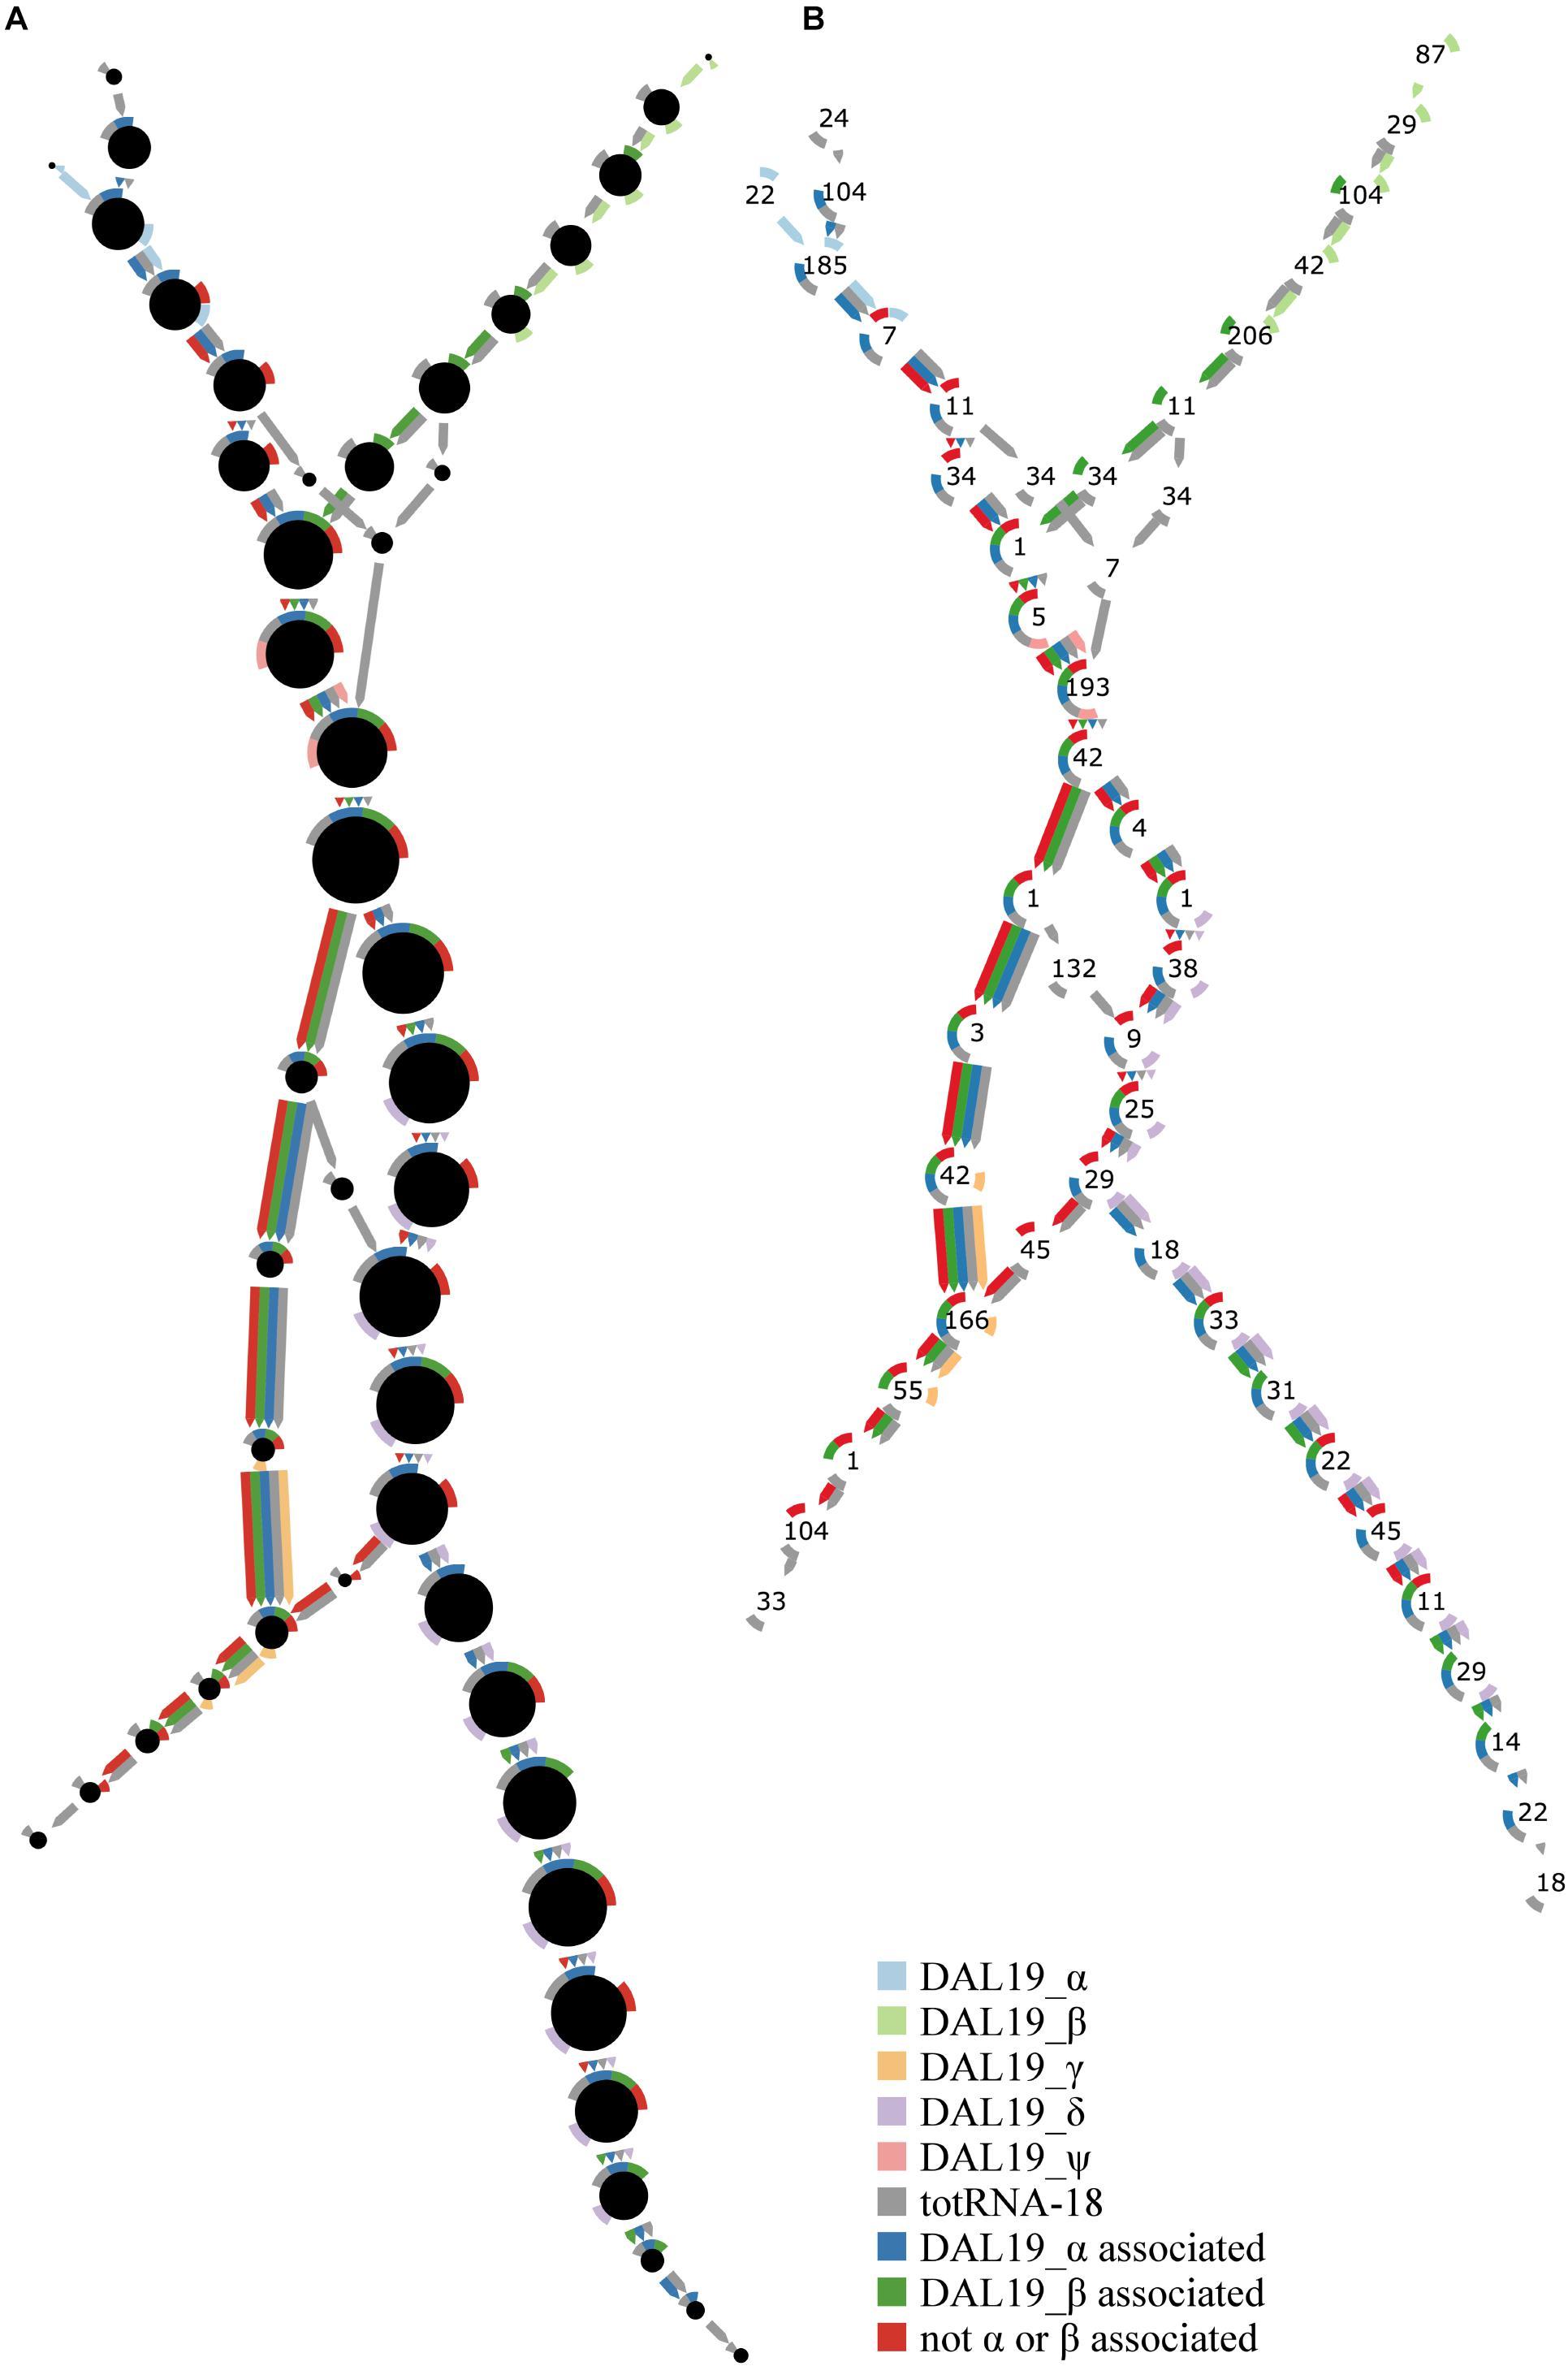 example_image